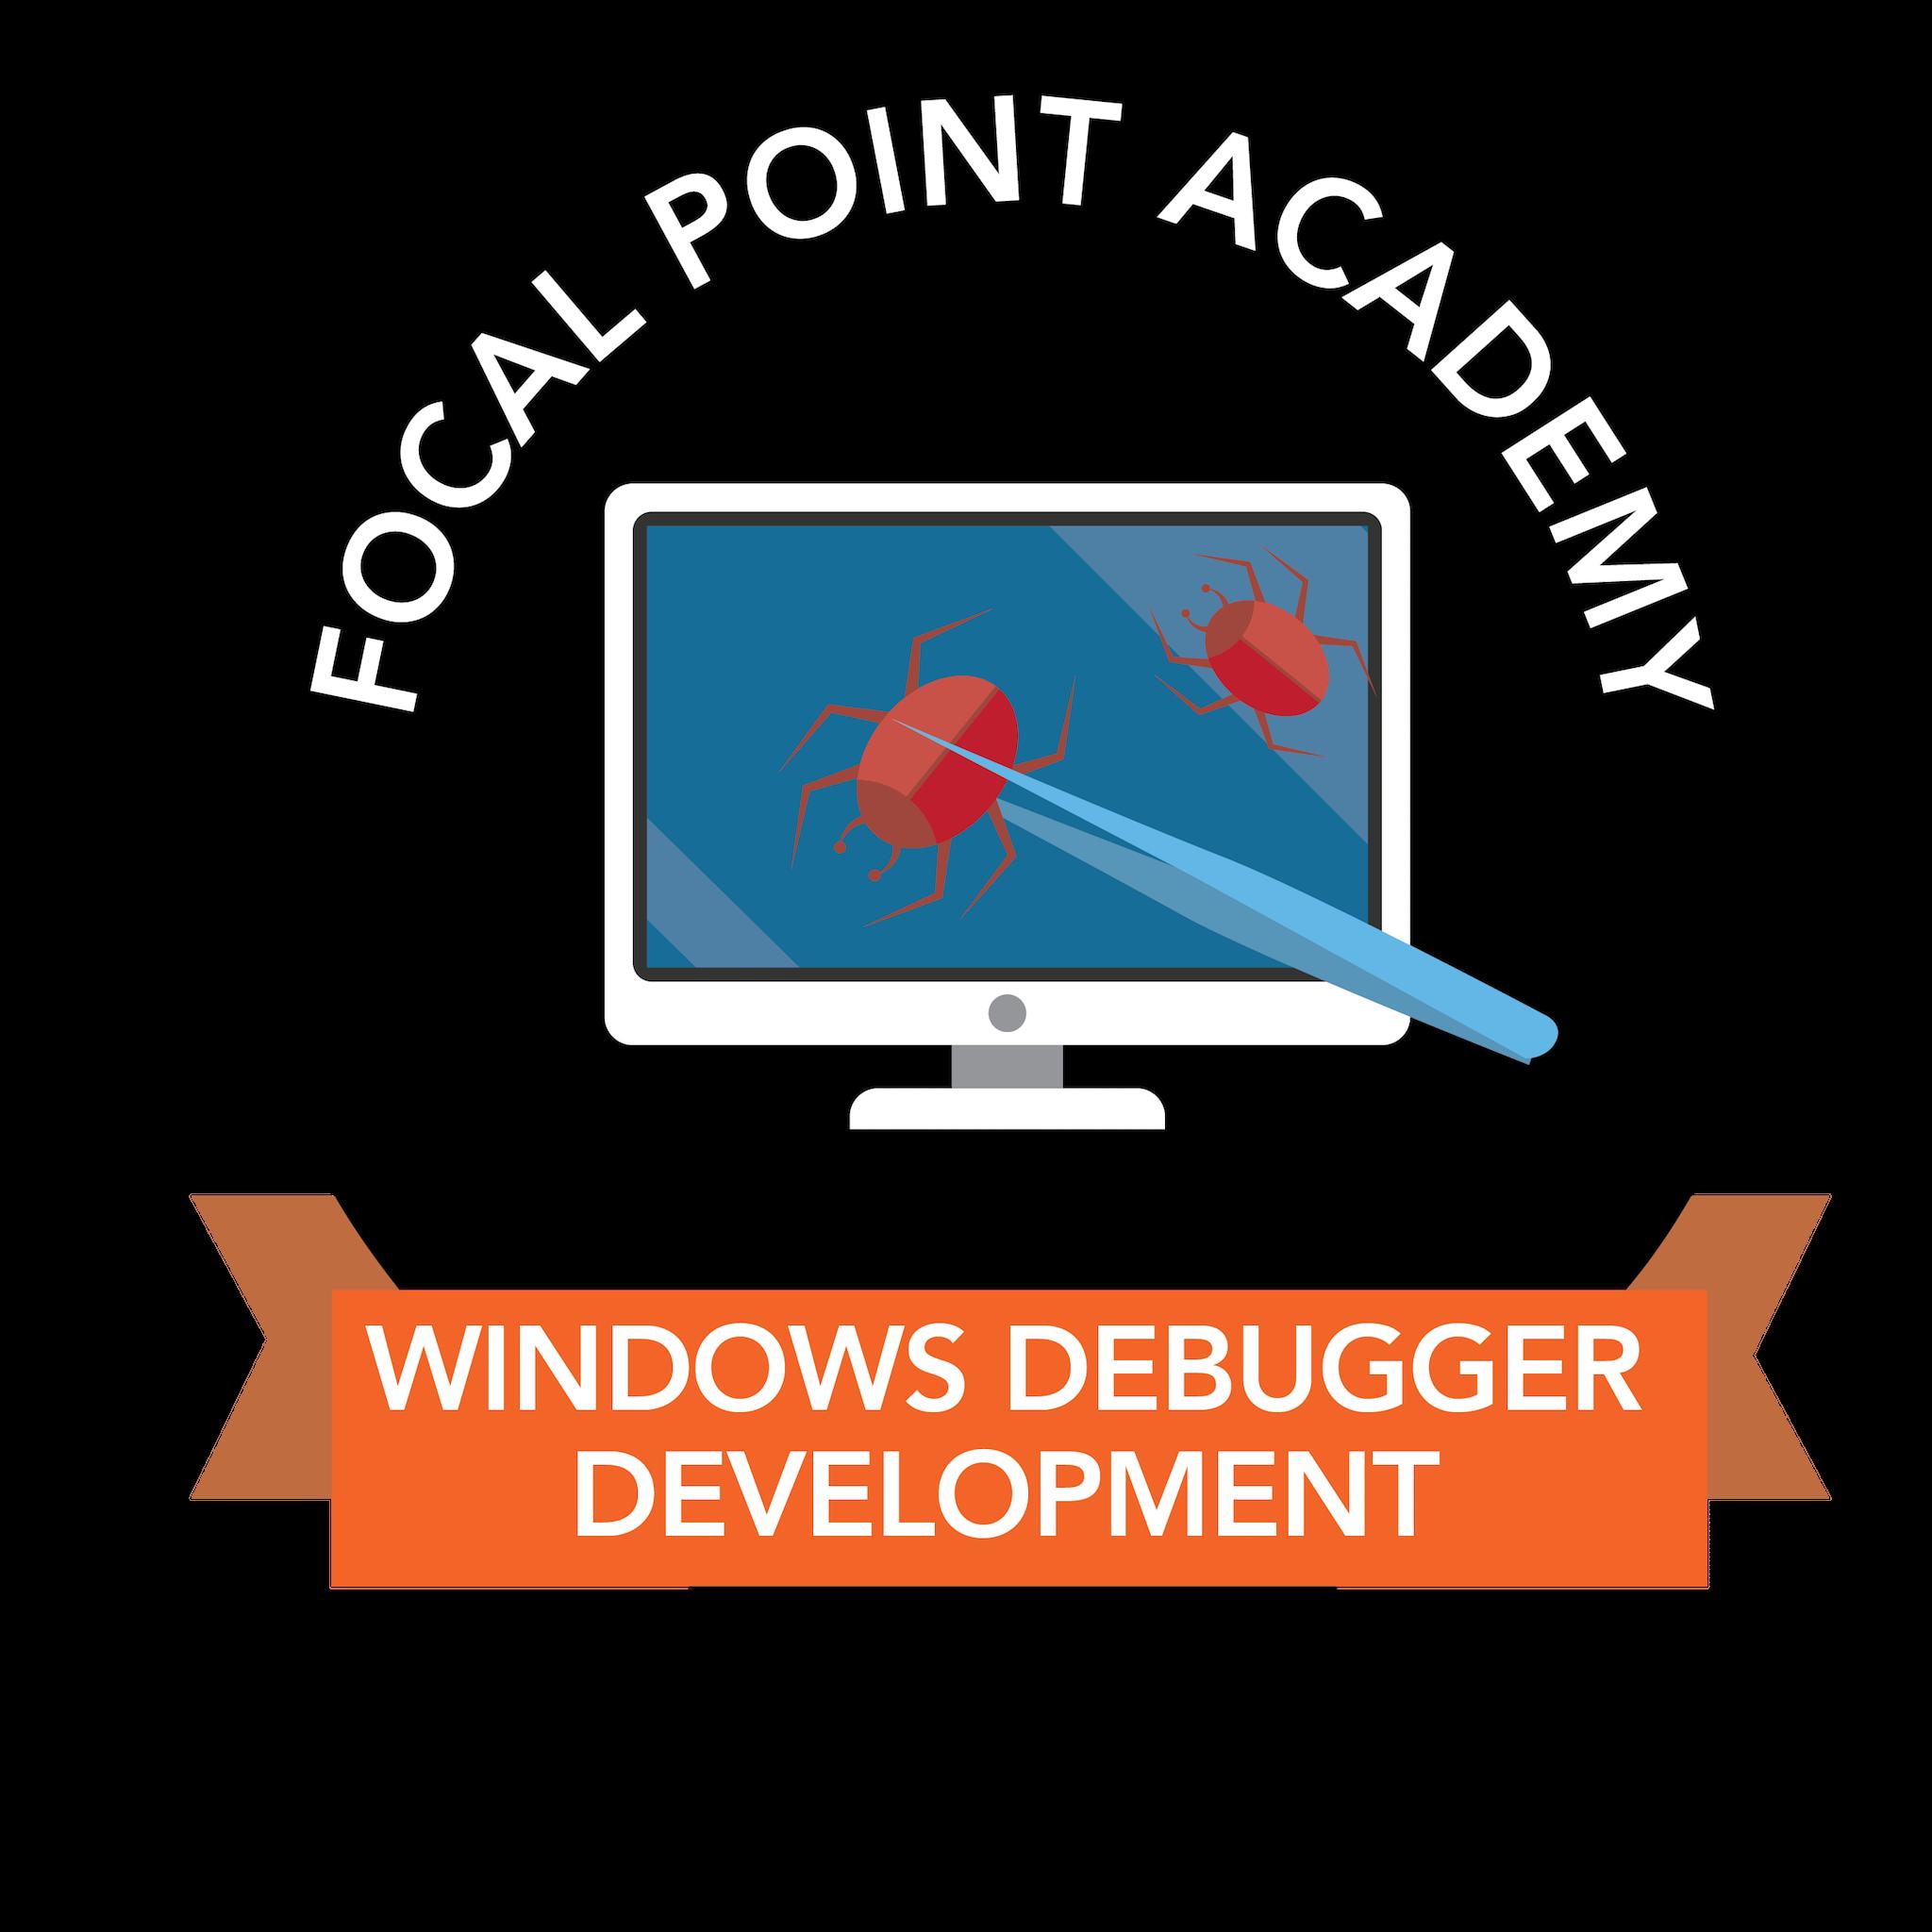 Windows Debugger Development